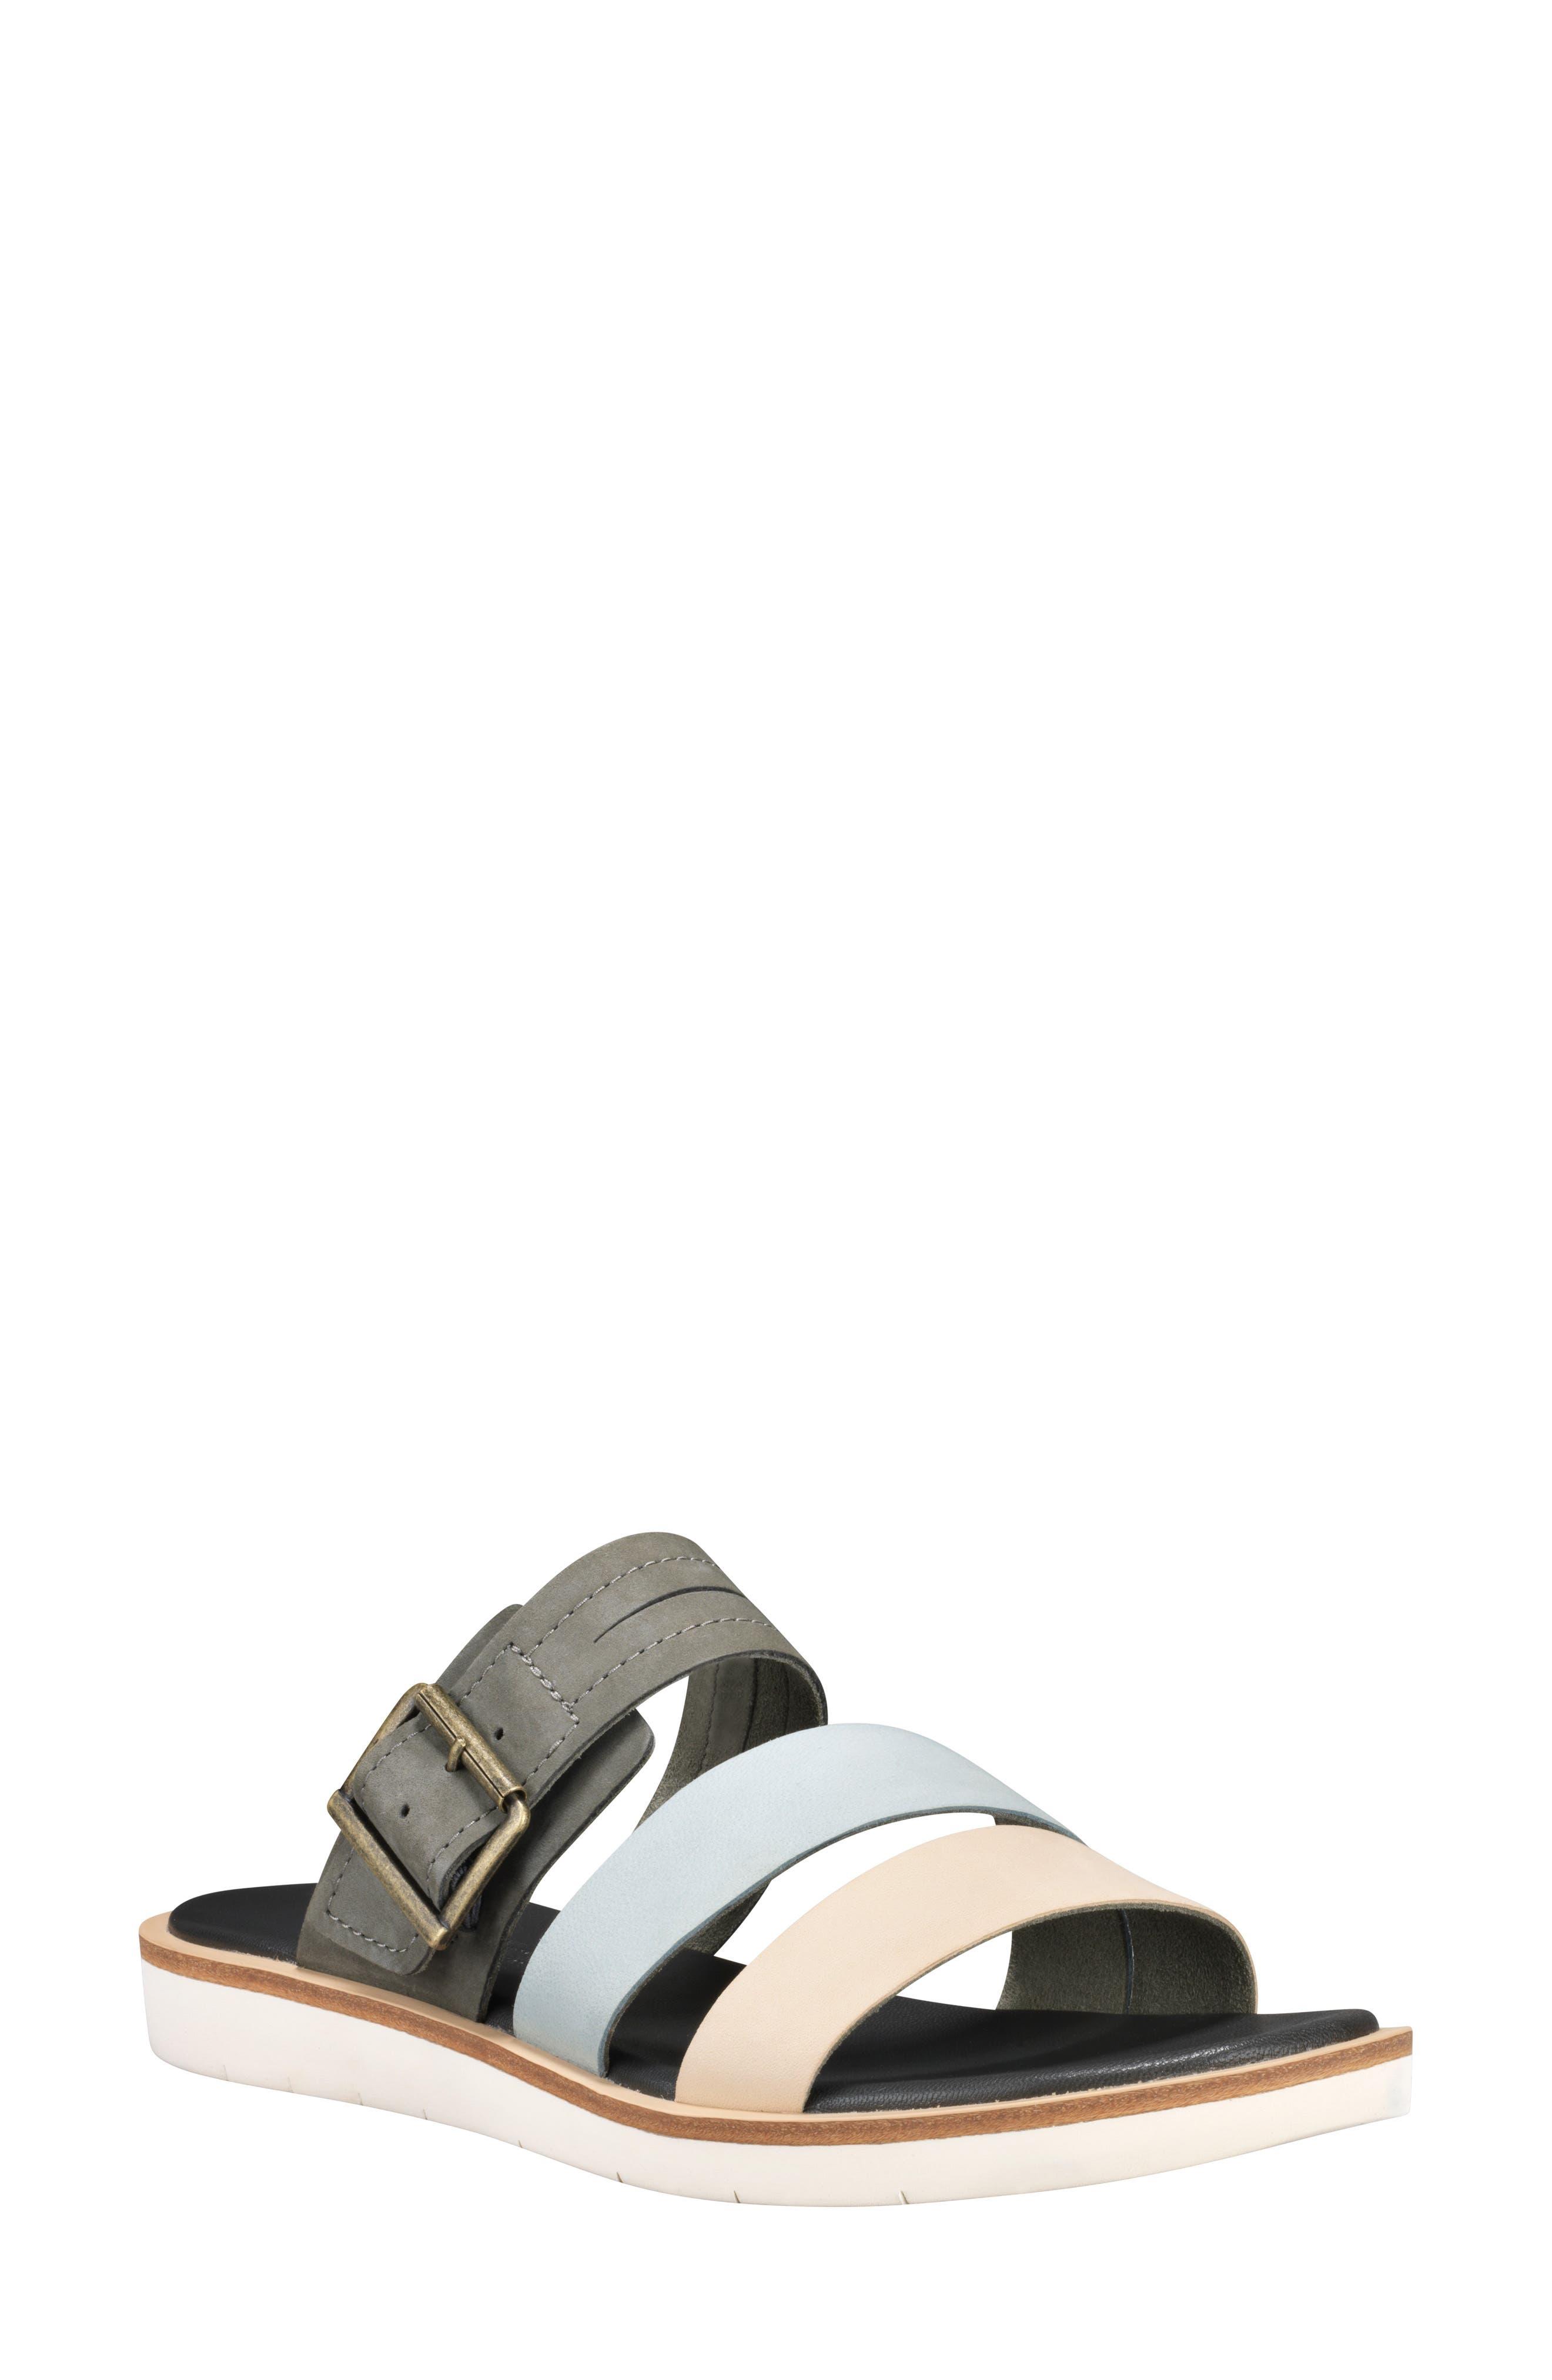 Timberland Adley Shore Slide Sandal- Grey